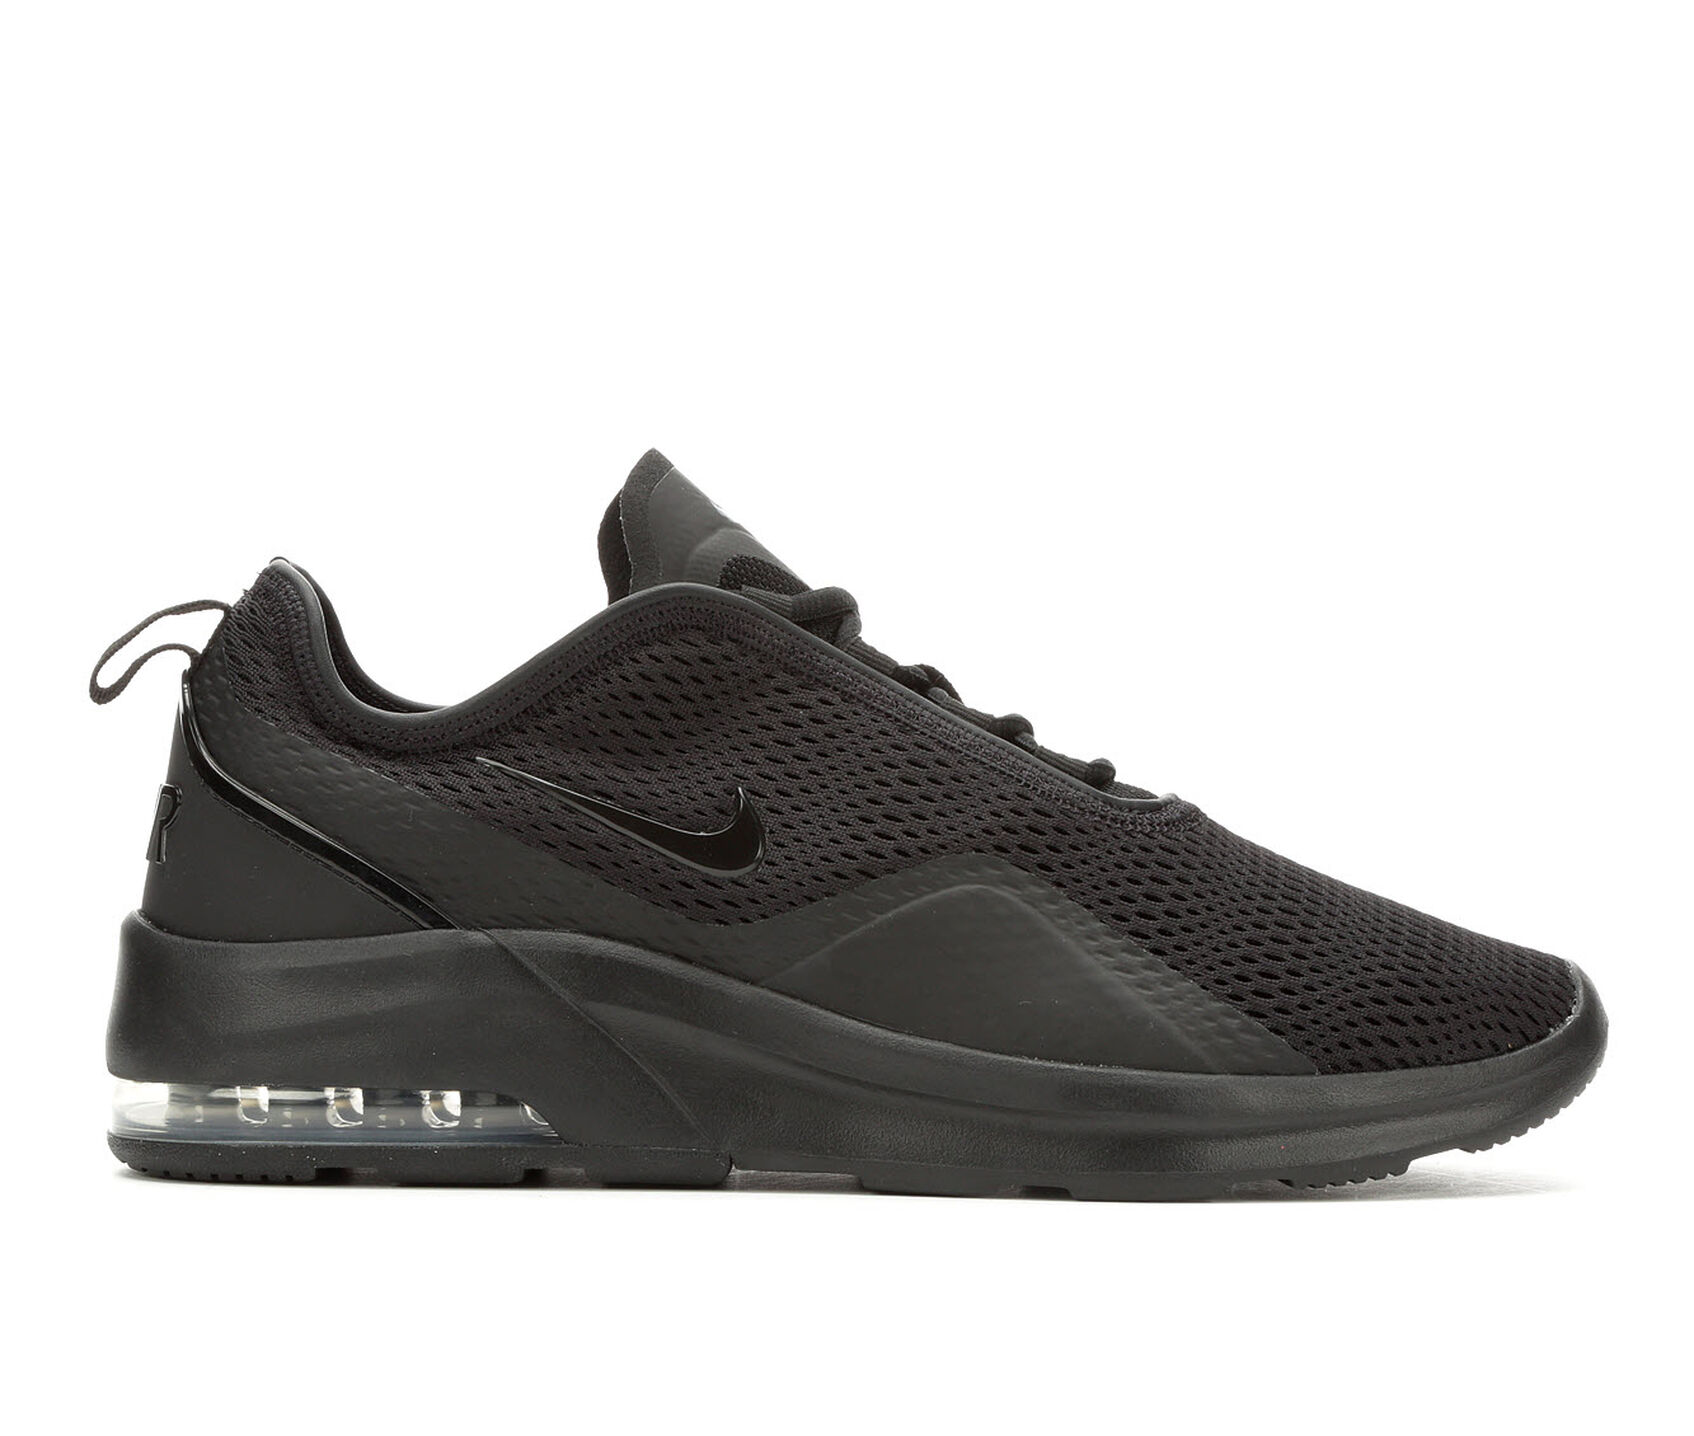 cheap for discount e848b 19f06 ... Nike Air Max Motion 2 Sneakers. Previous